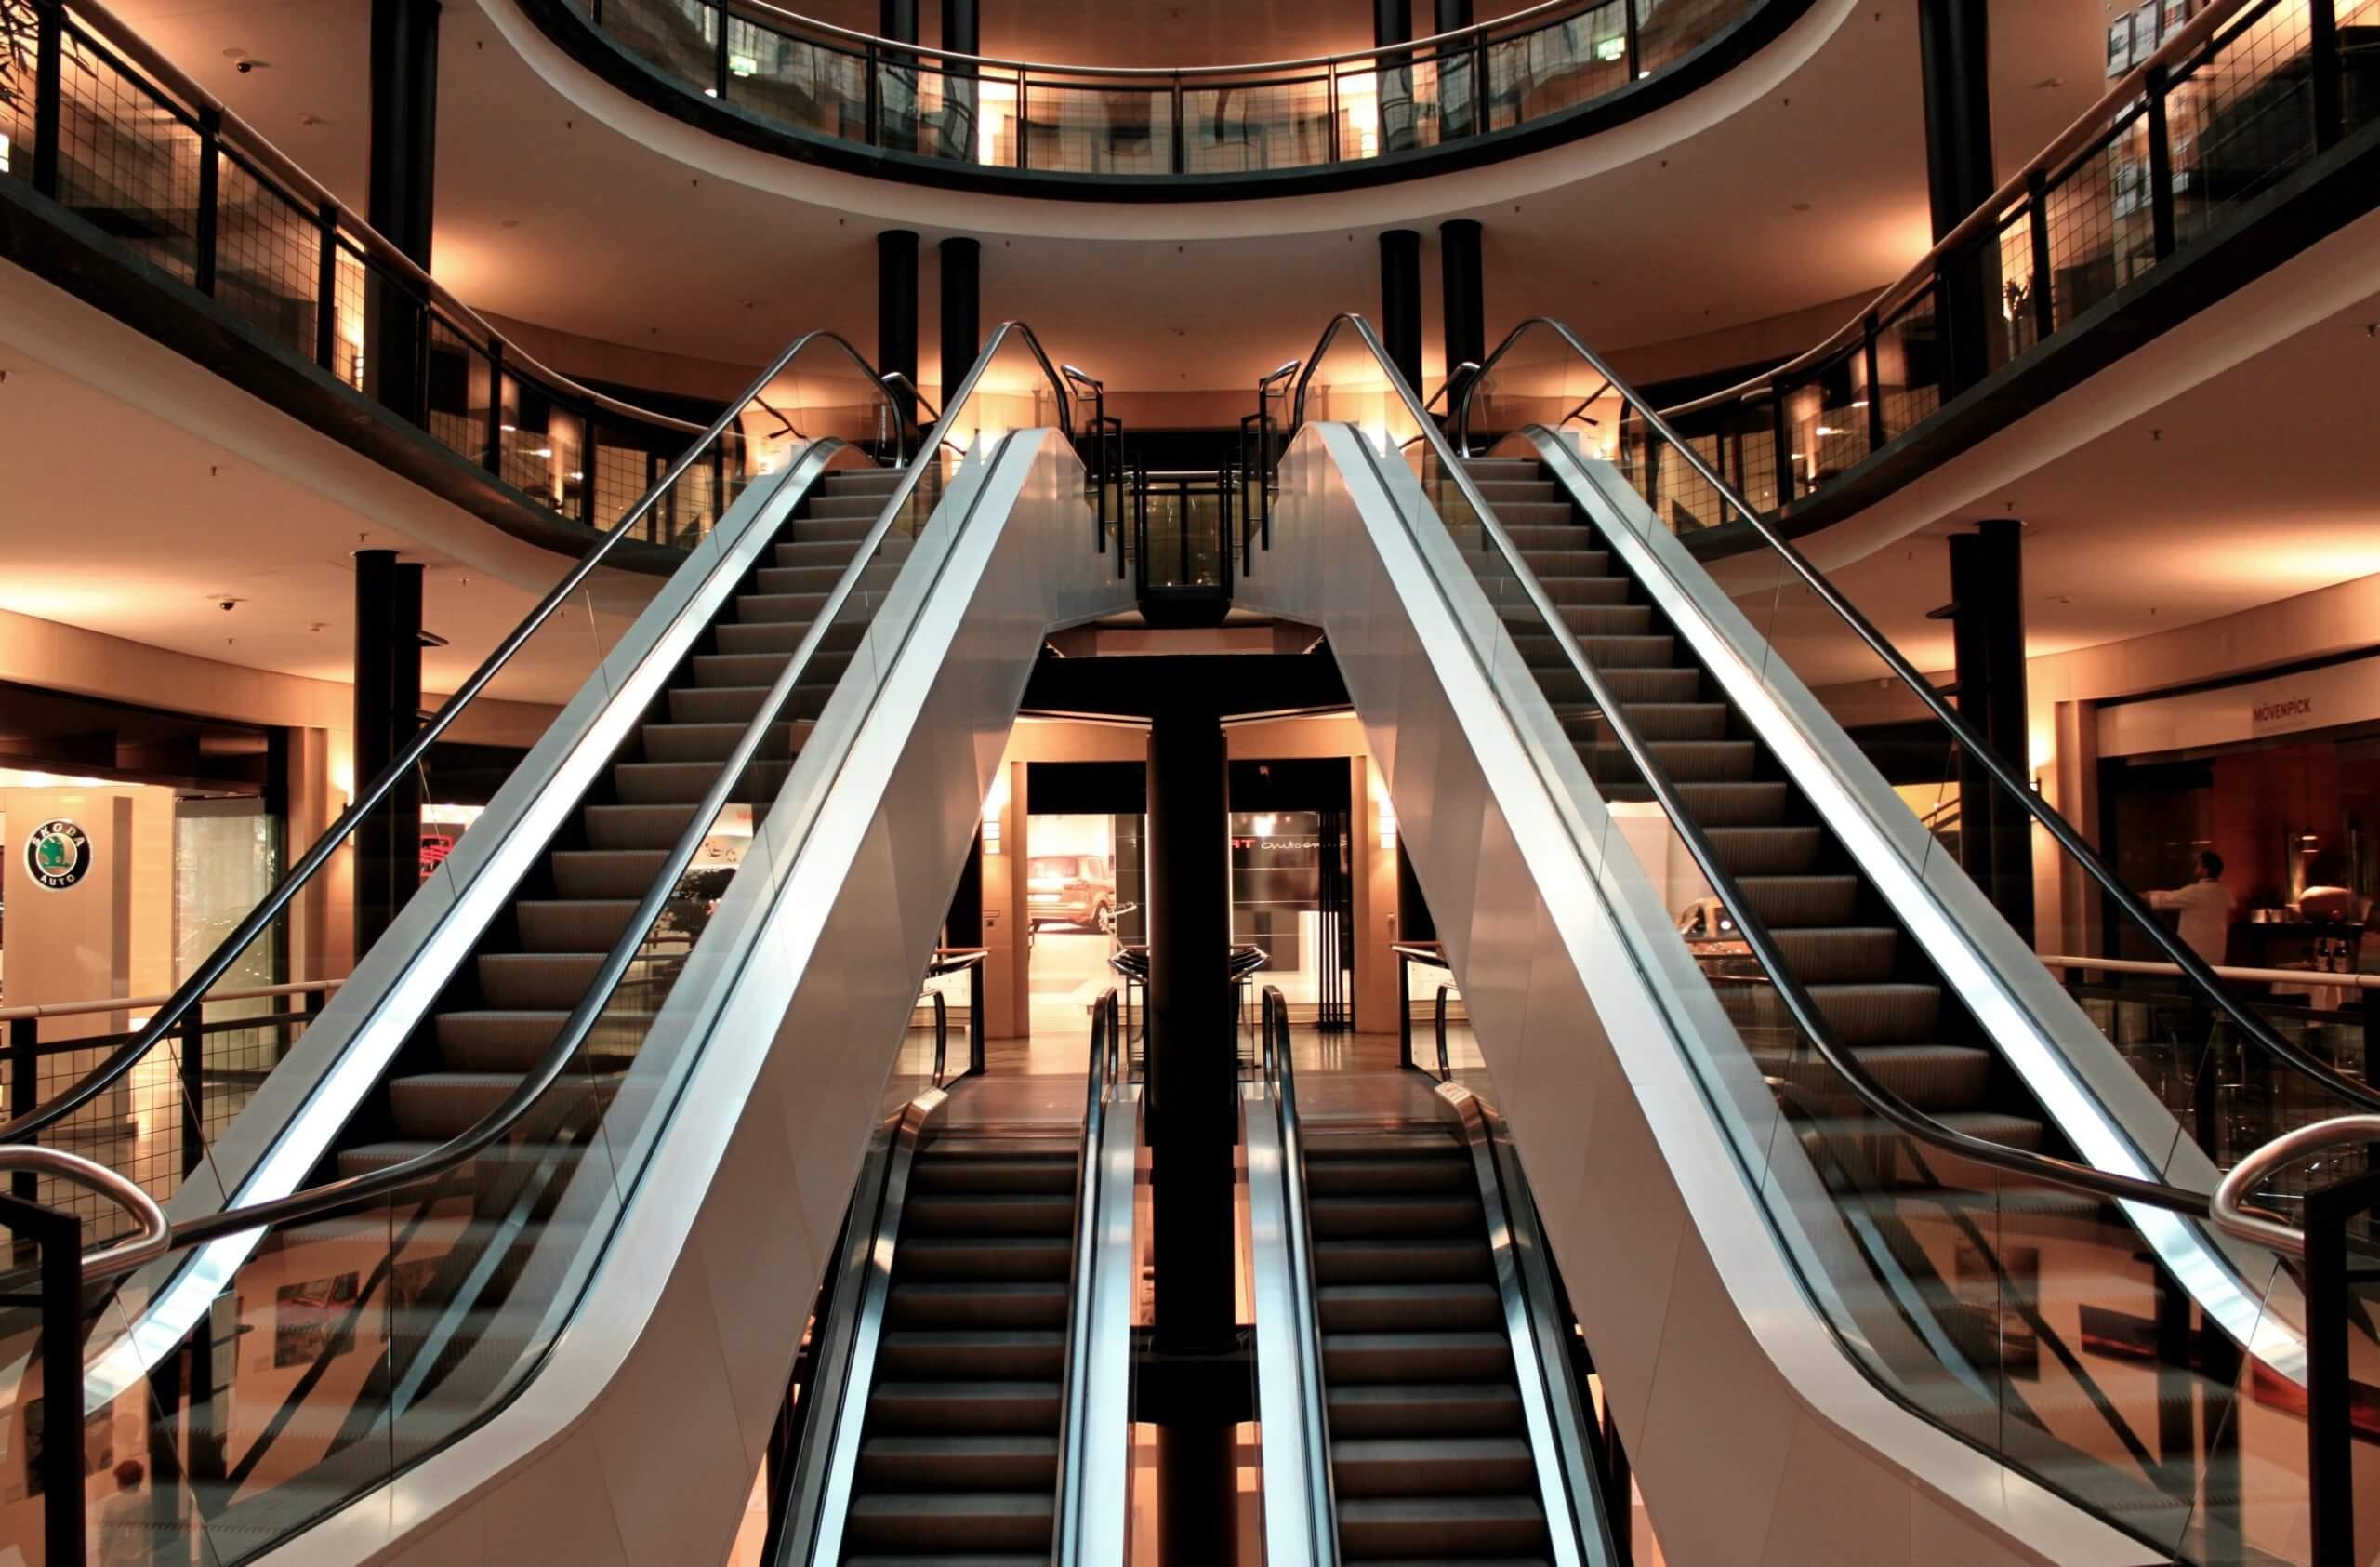 winkelcentrum-letselschade